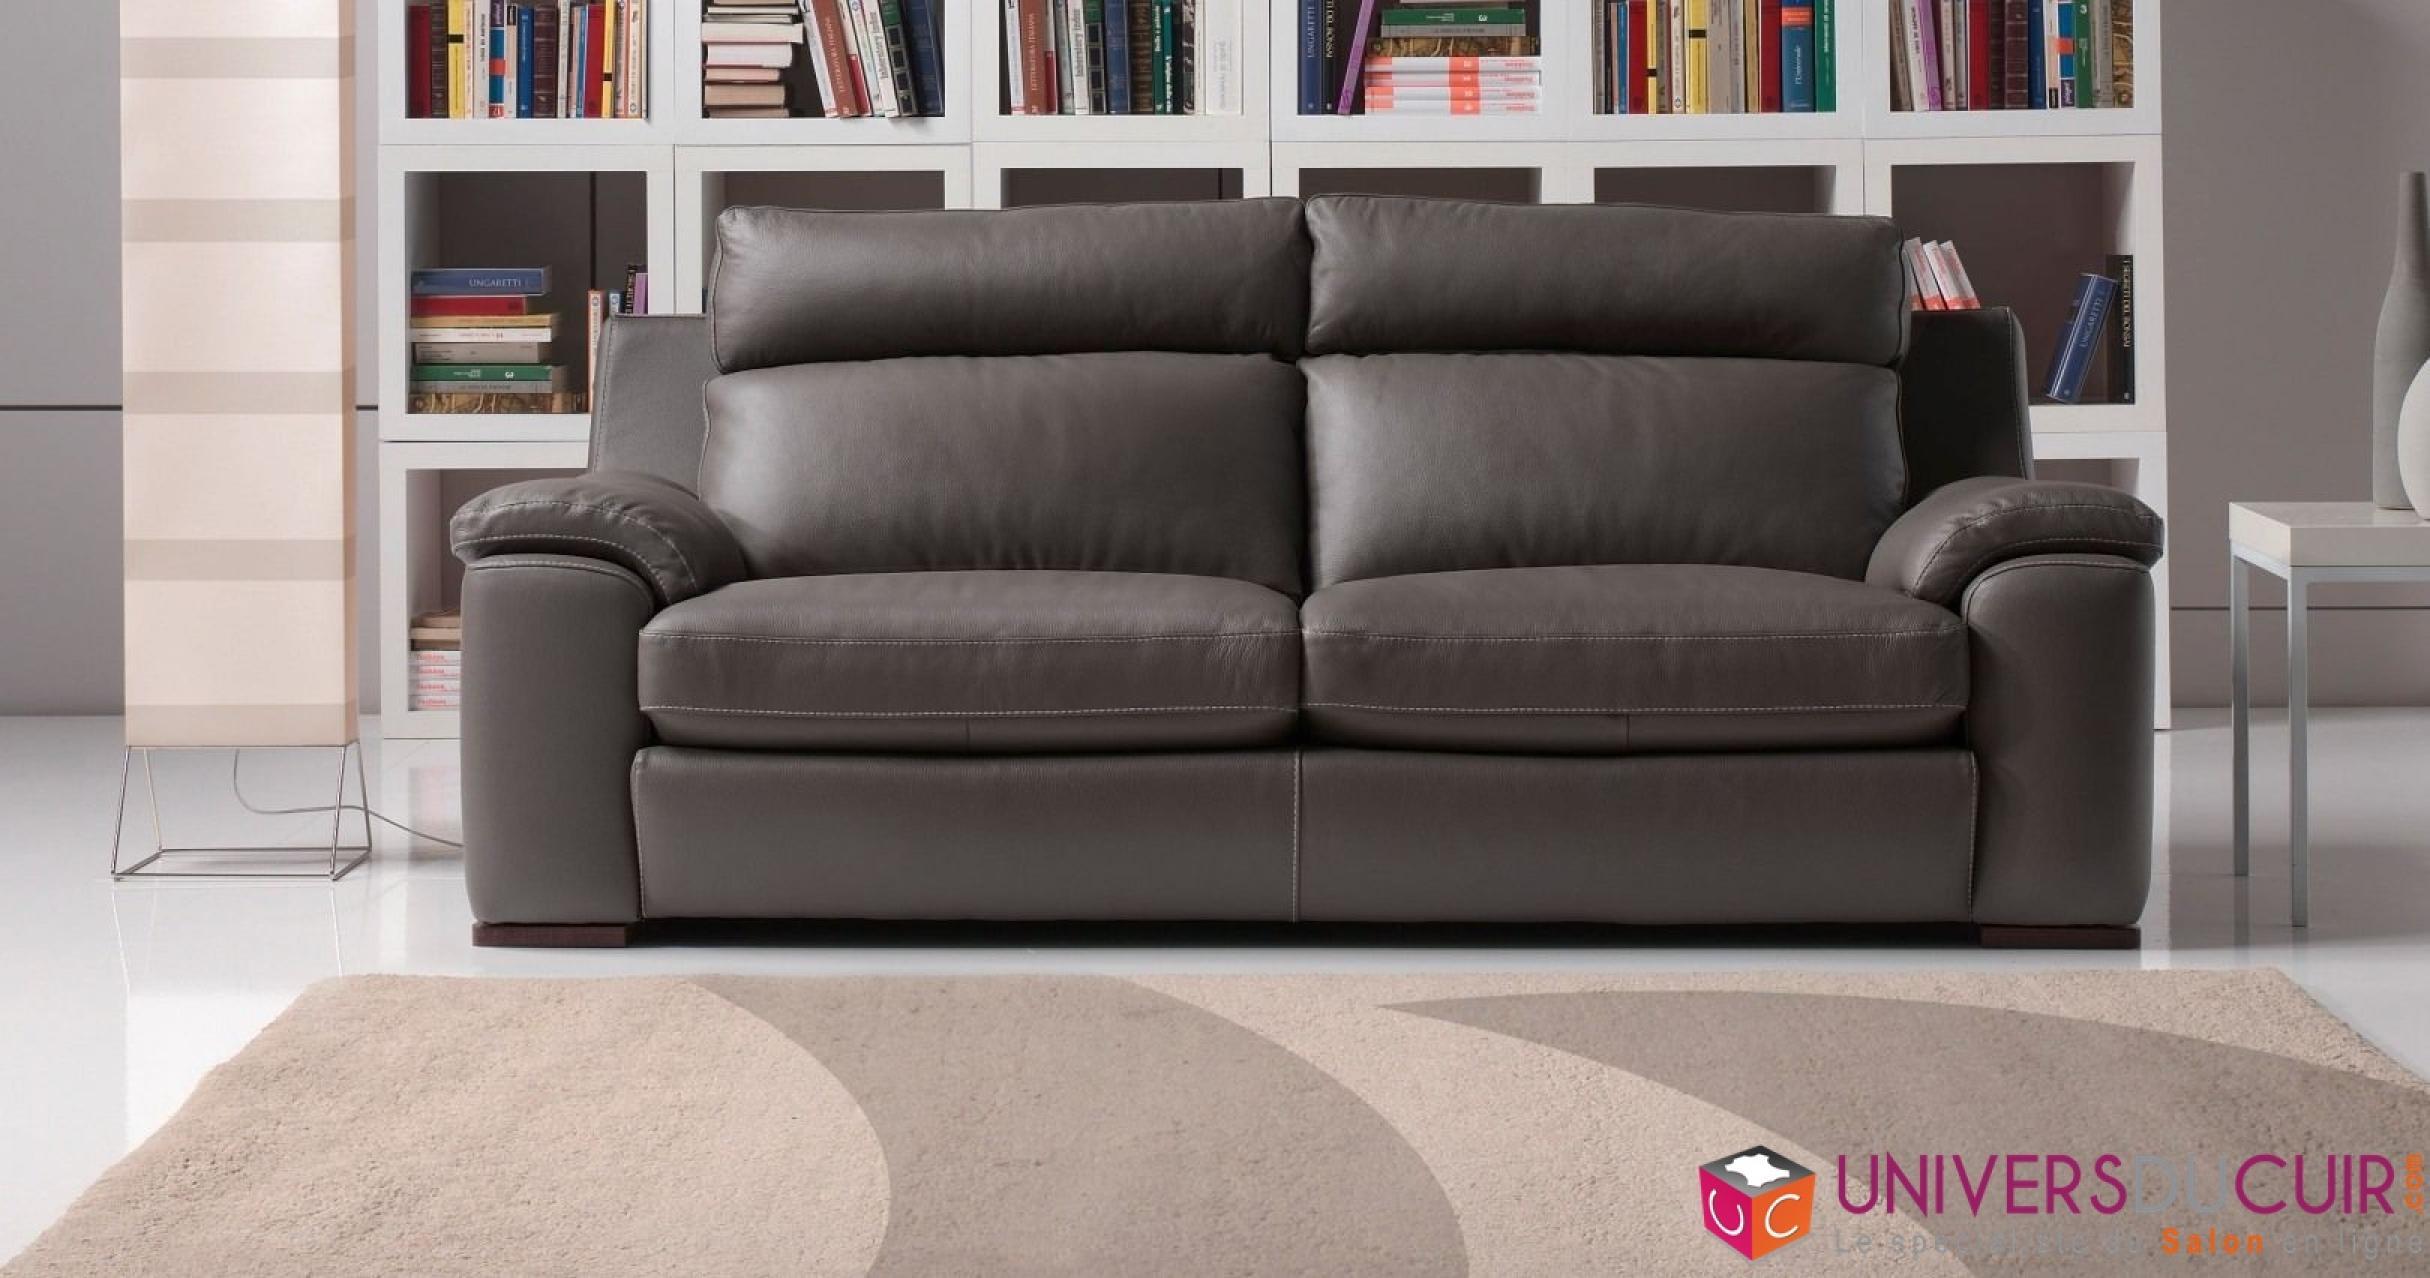 photos canap haut dossier. Black Bedroom Furniture Sets. Home Design Ideas